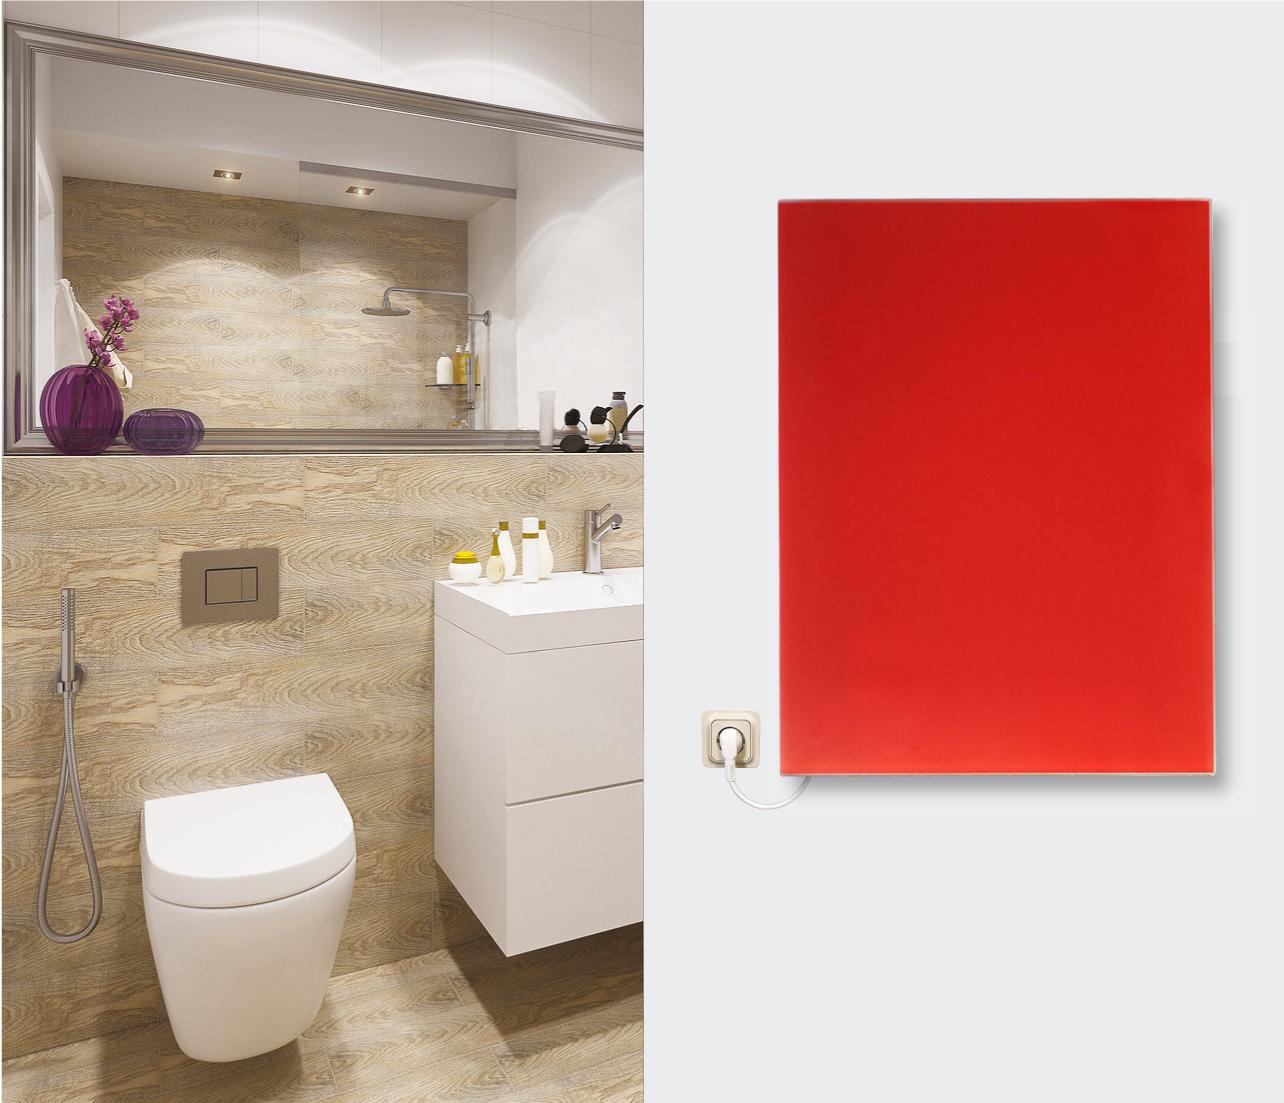 infrarot glasheizk rper wand heizpaneele 50x50 350w viele. Black Bedroom Furniture Sets. Home Design Ideas